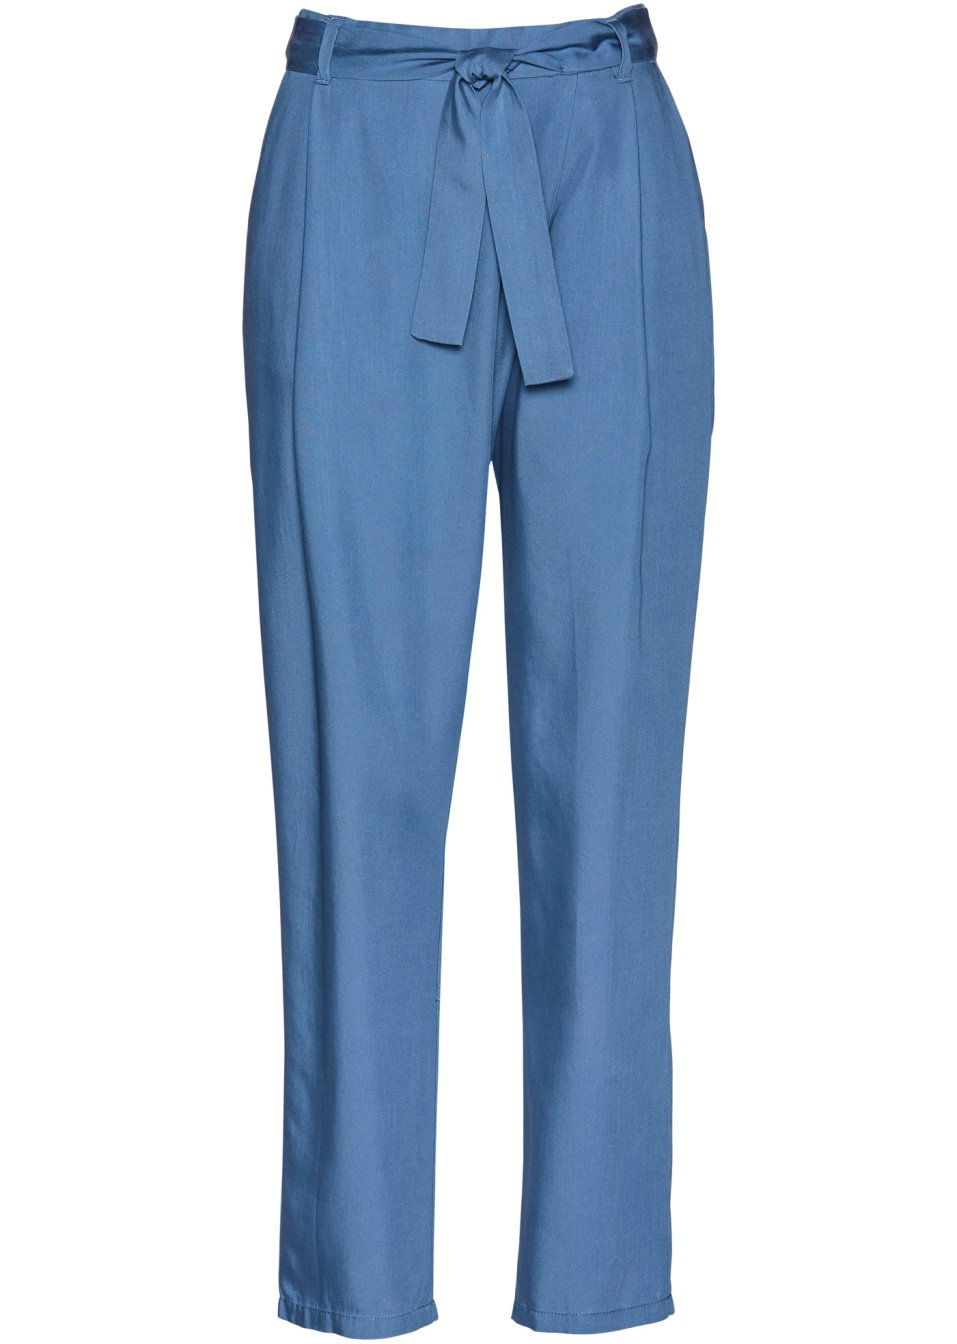 Bundfaltenhose aus TENCEL™ Lyocelll jeansblau - bpc selection premium online bestellen - bonprix.de tgZc7 E8x7J